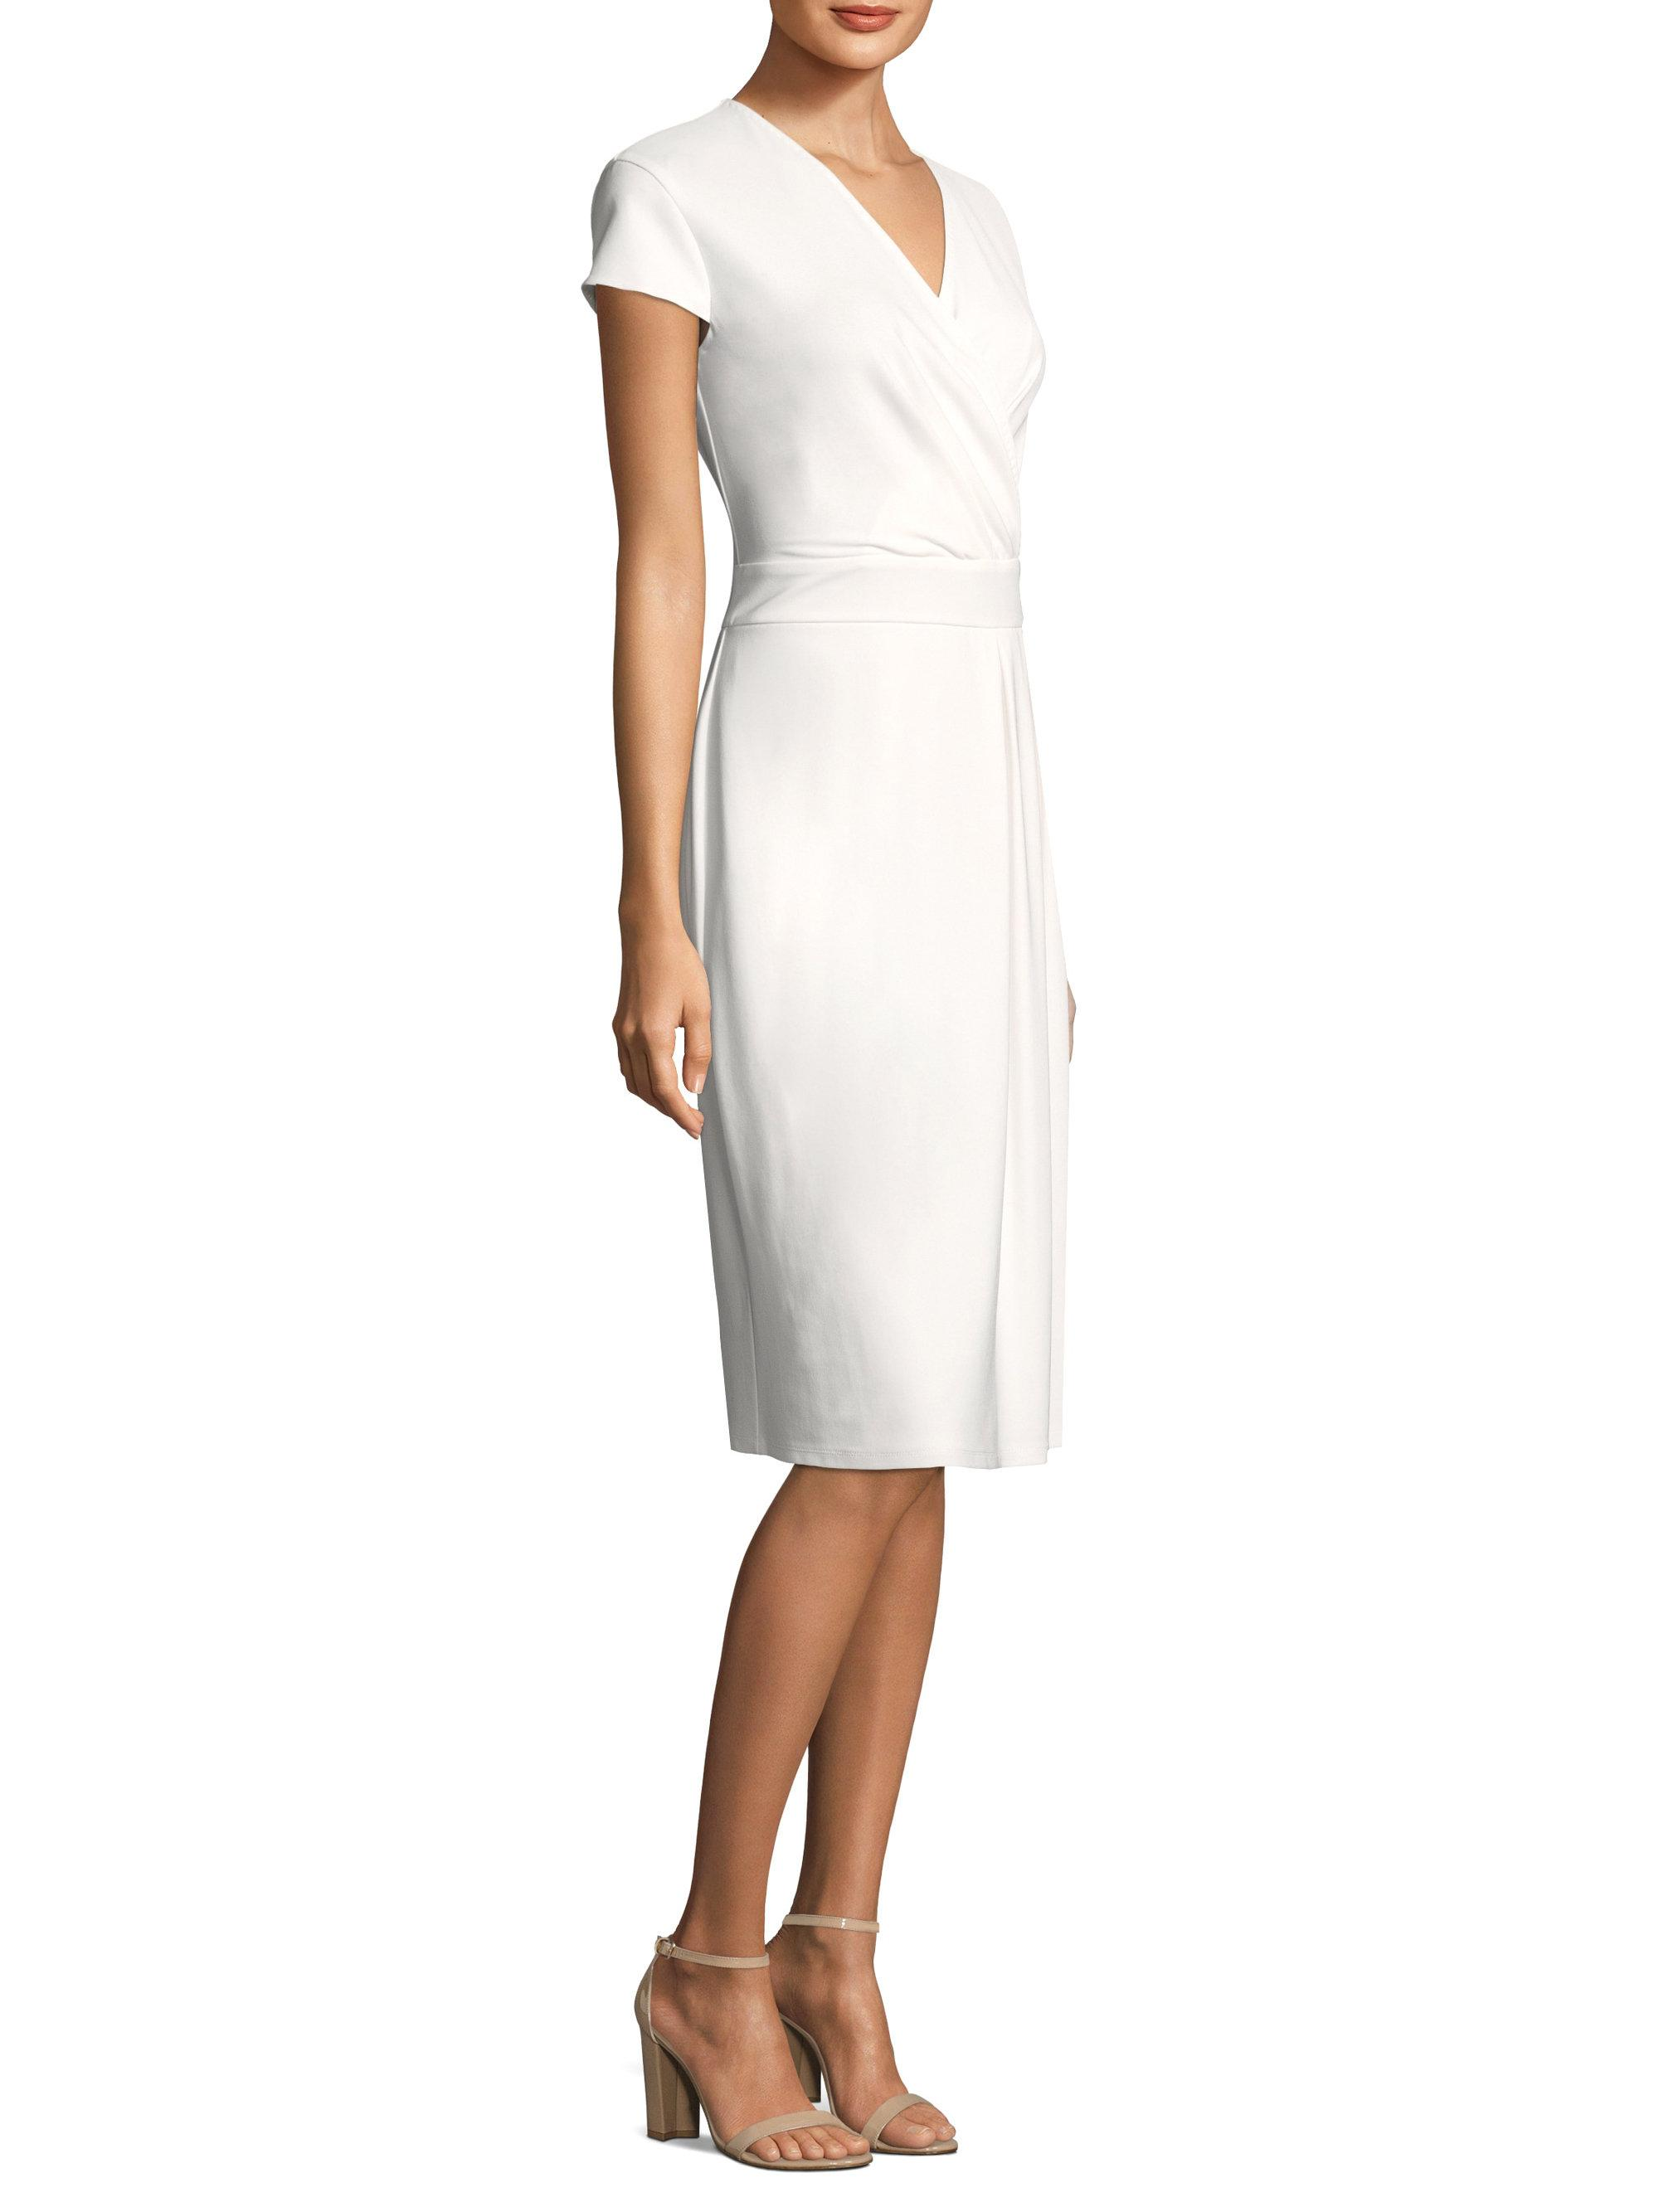 16e180dbc1 Max Mara Feluca Evening Dress in White - Lyst